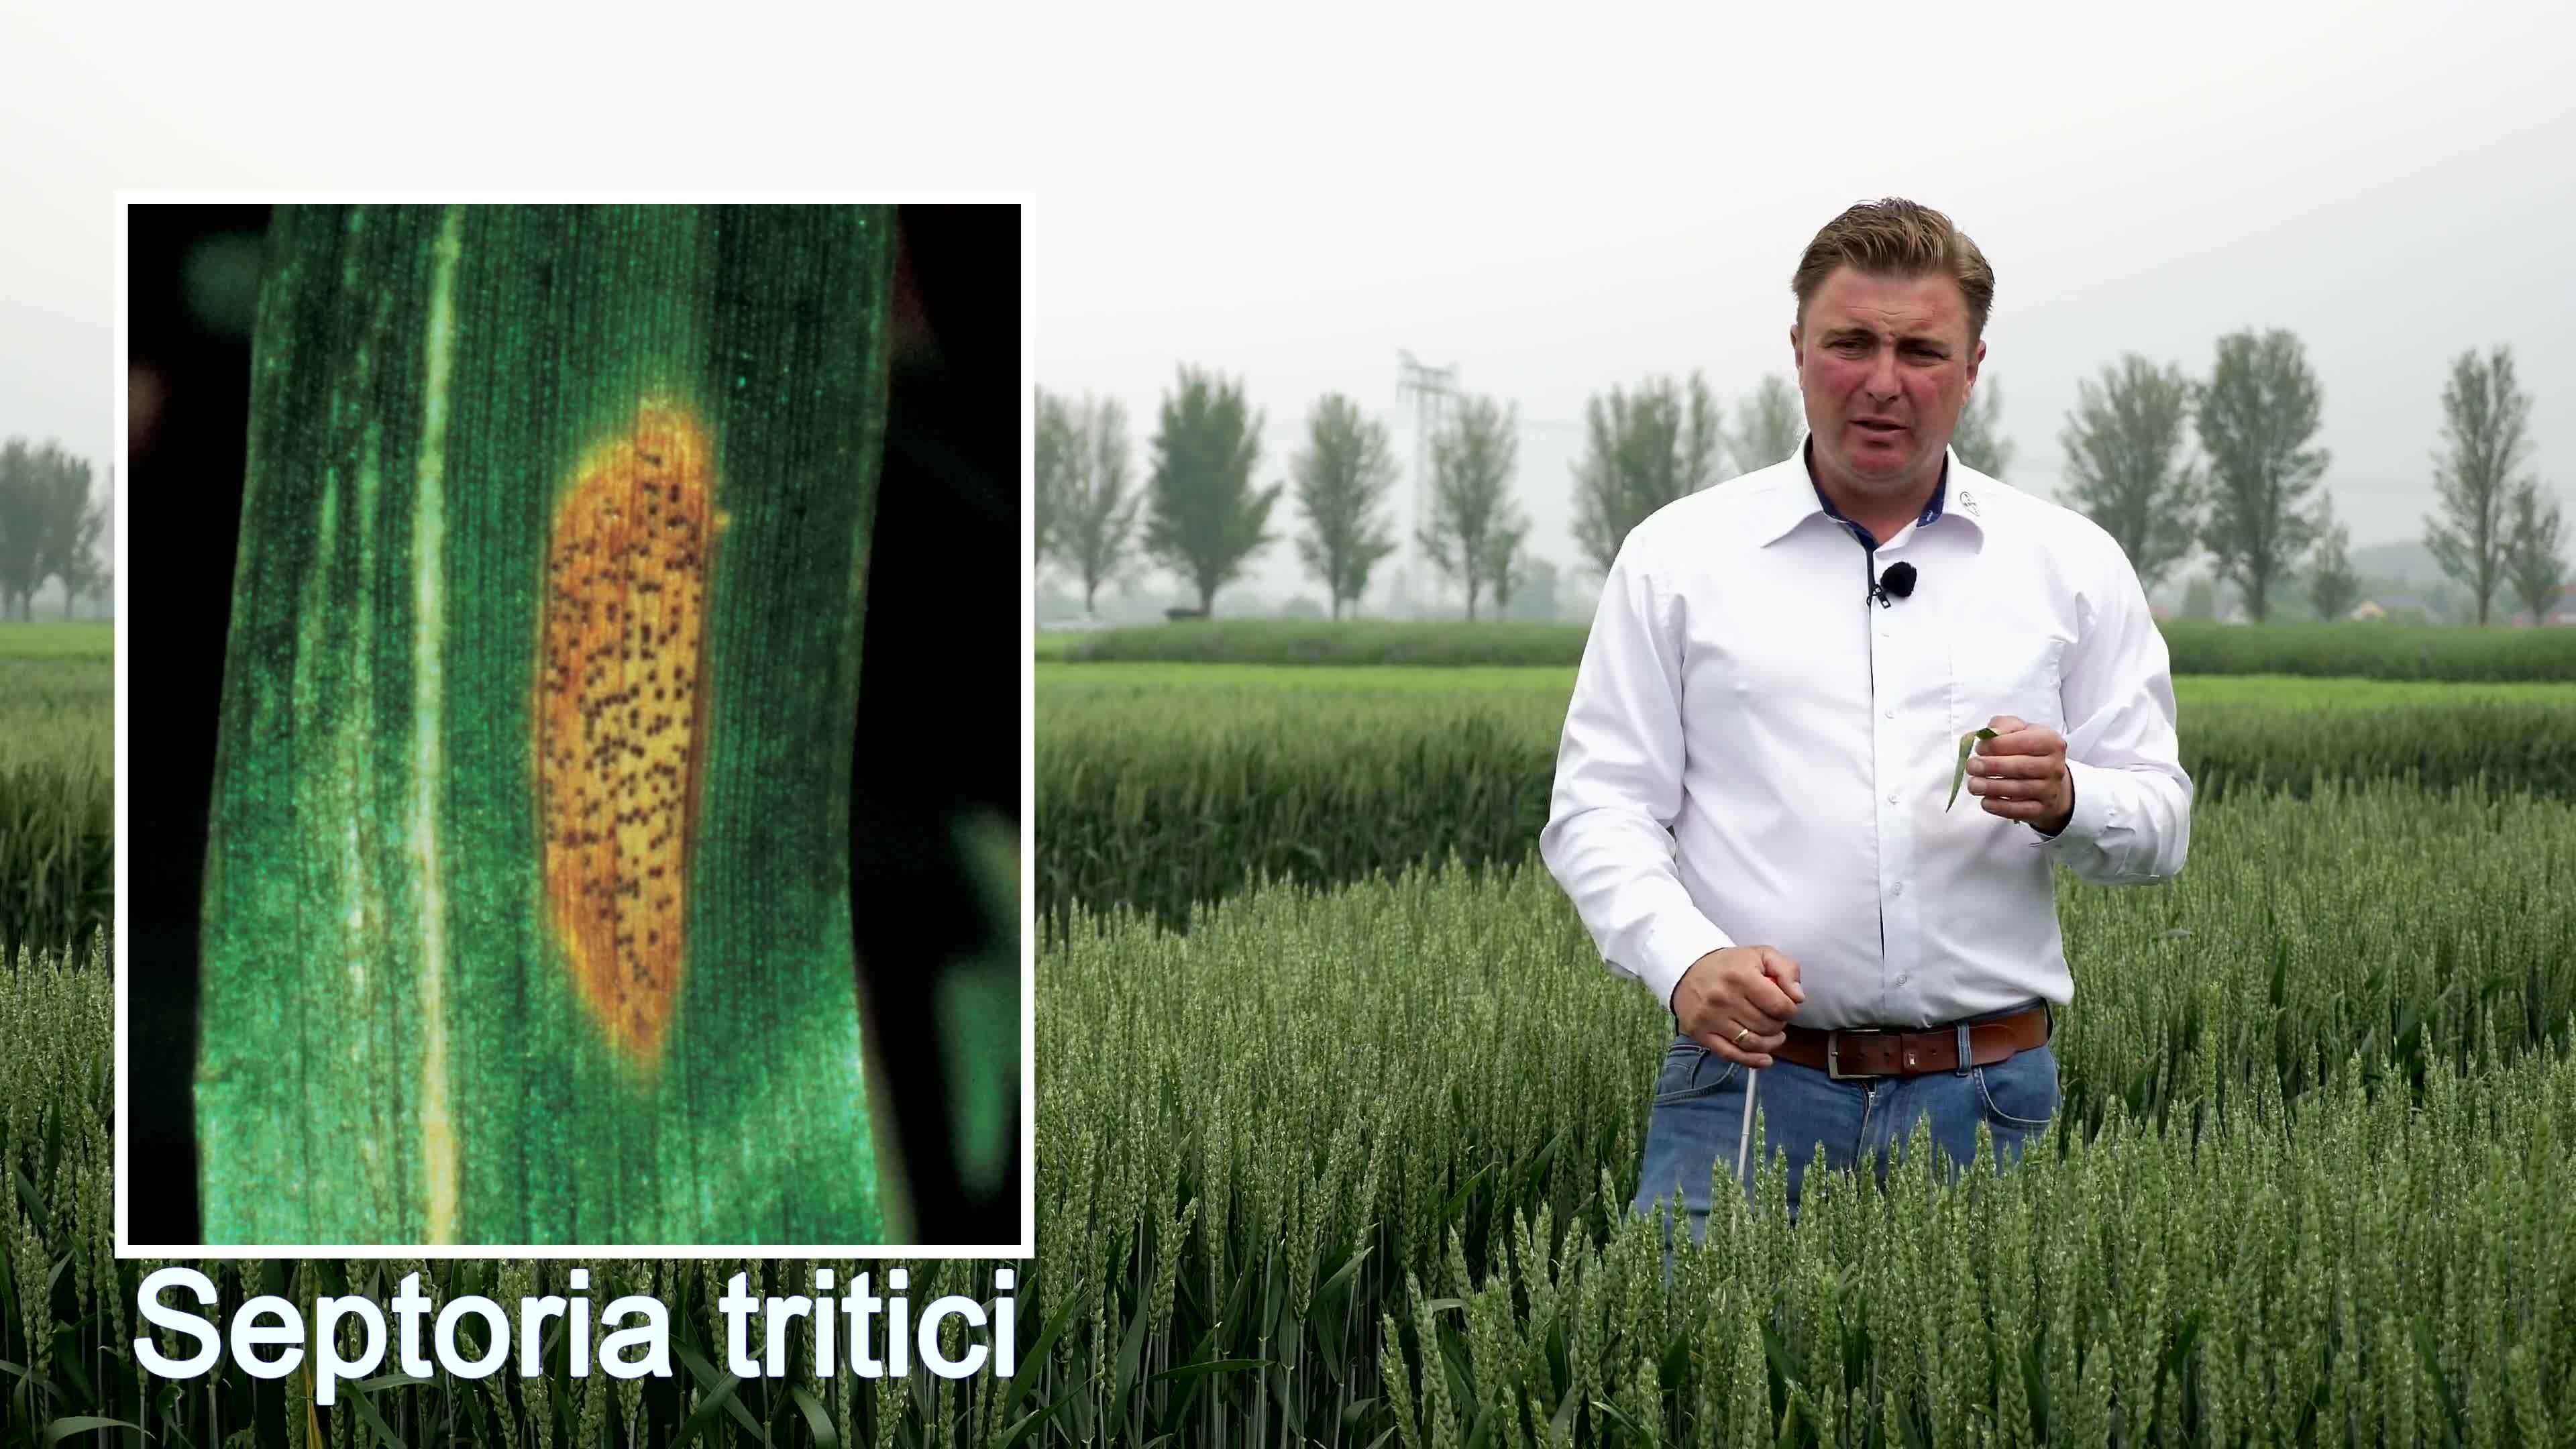 Standortreport Döbernitz - Fungizidstrategie gegen Septoria tritici in Winterweizen